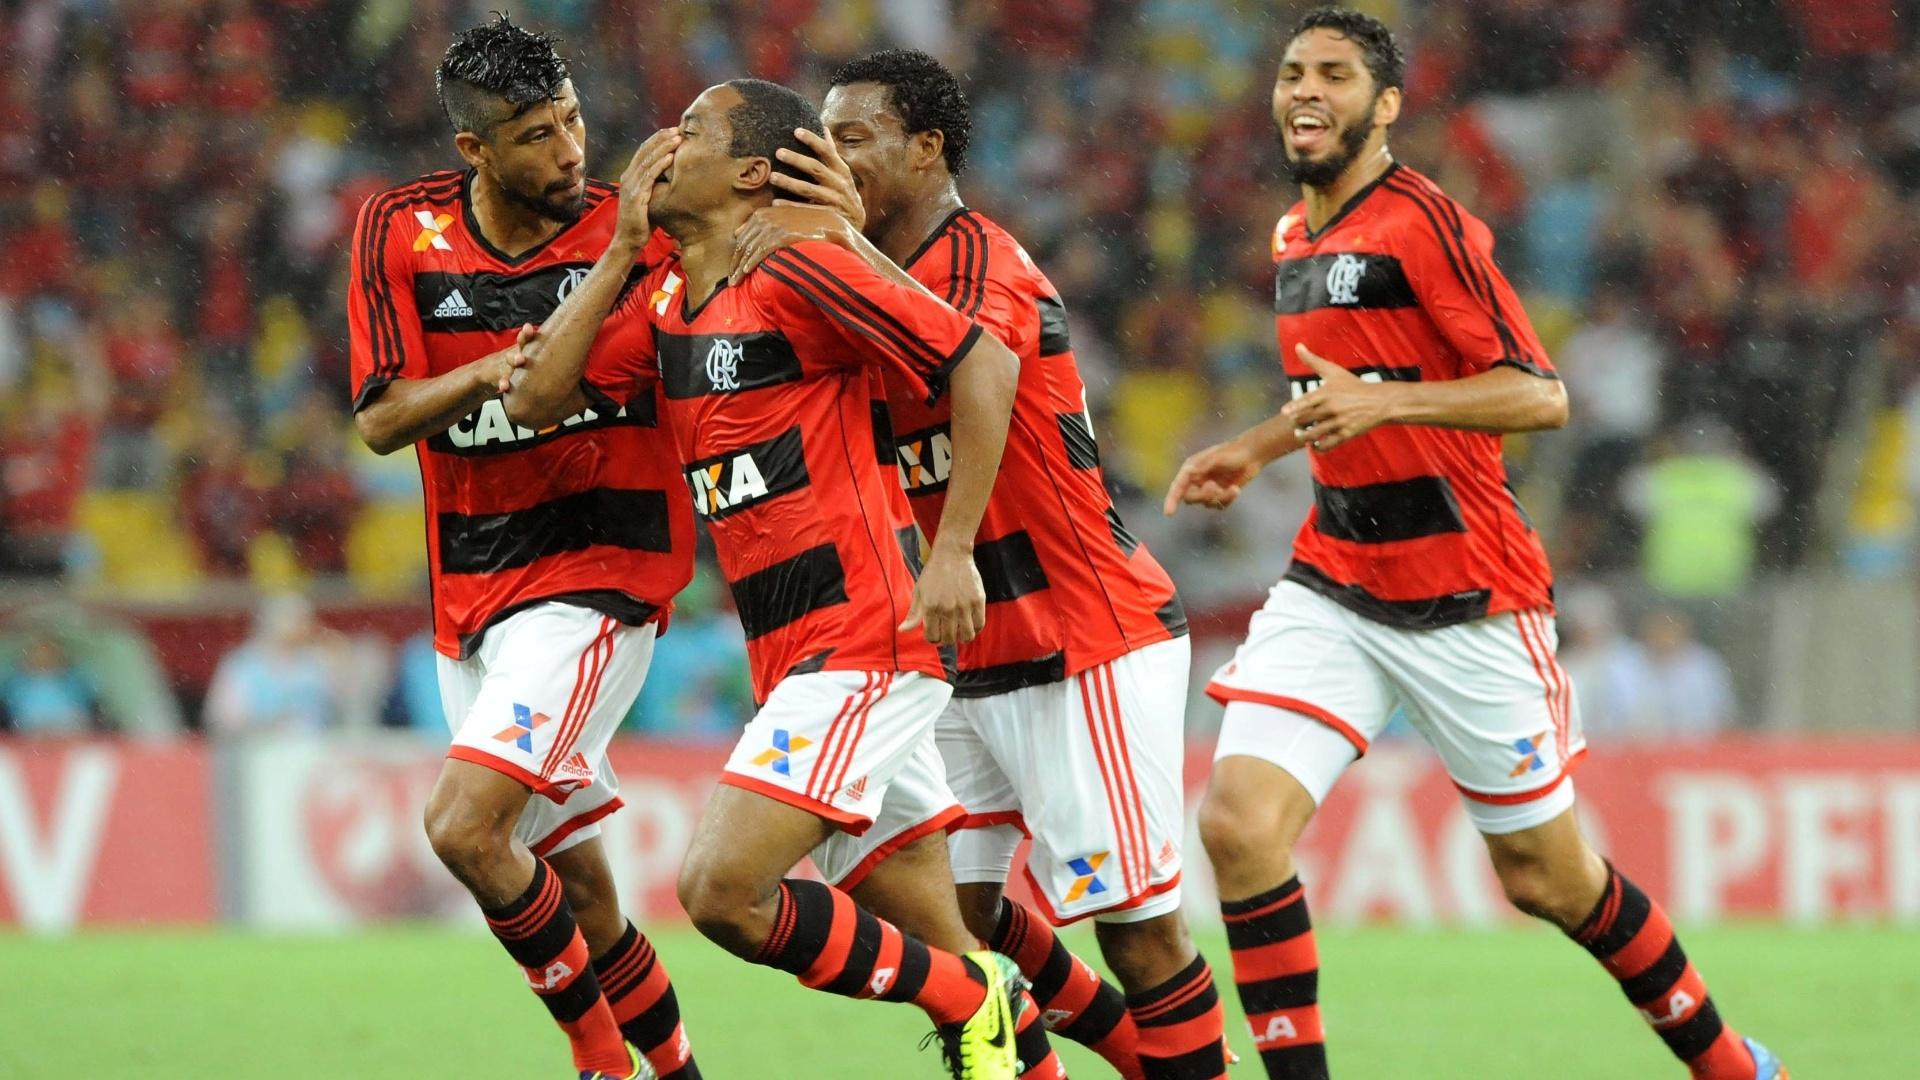 06.nov.2013 Cercado por Léo Moura (e), Amaral e Wallace (d), Elias (centro) comemora o segundo gol do Flamengo contra o Goiás, no Maracanã